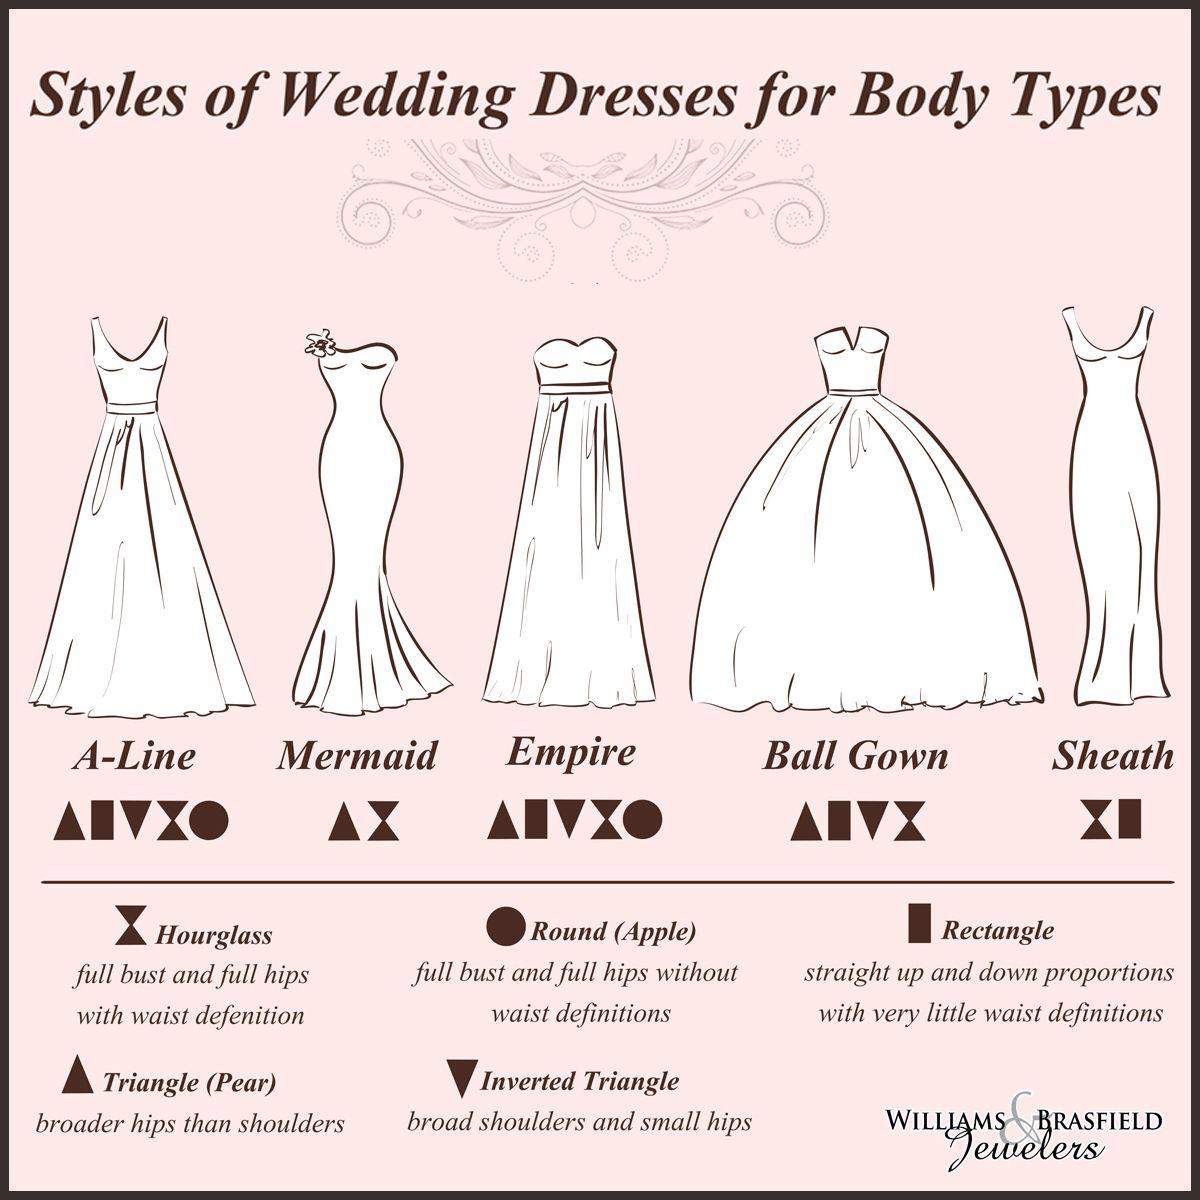 Design your own wedding dress for fun  Pin by Williamus u Brasfieldus Diamond Jewelers on Bridal Gowns